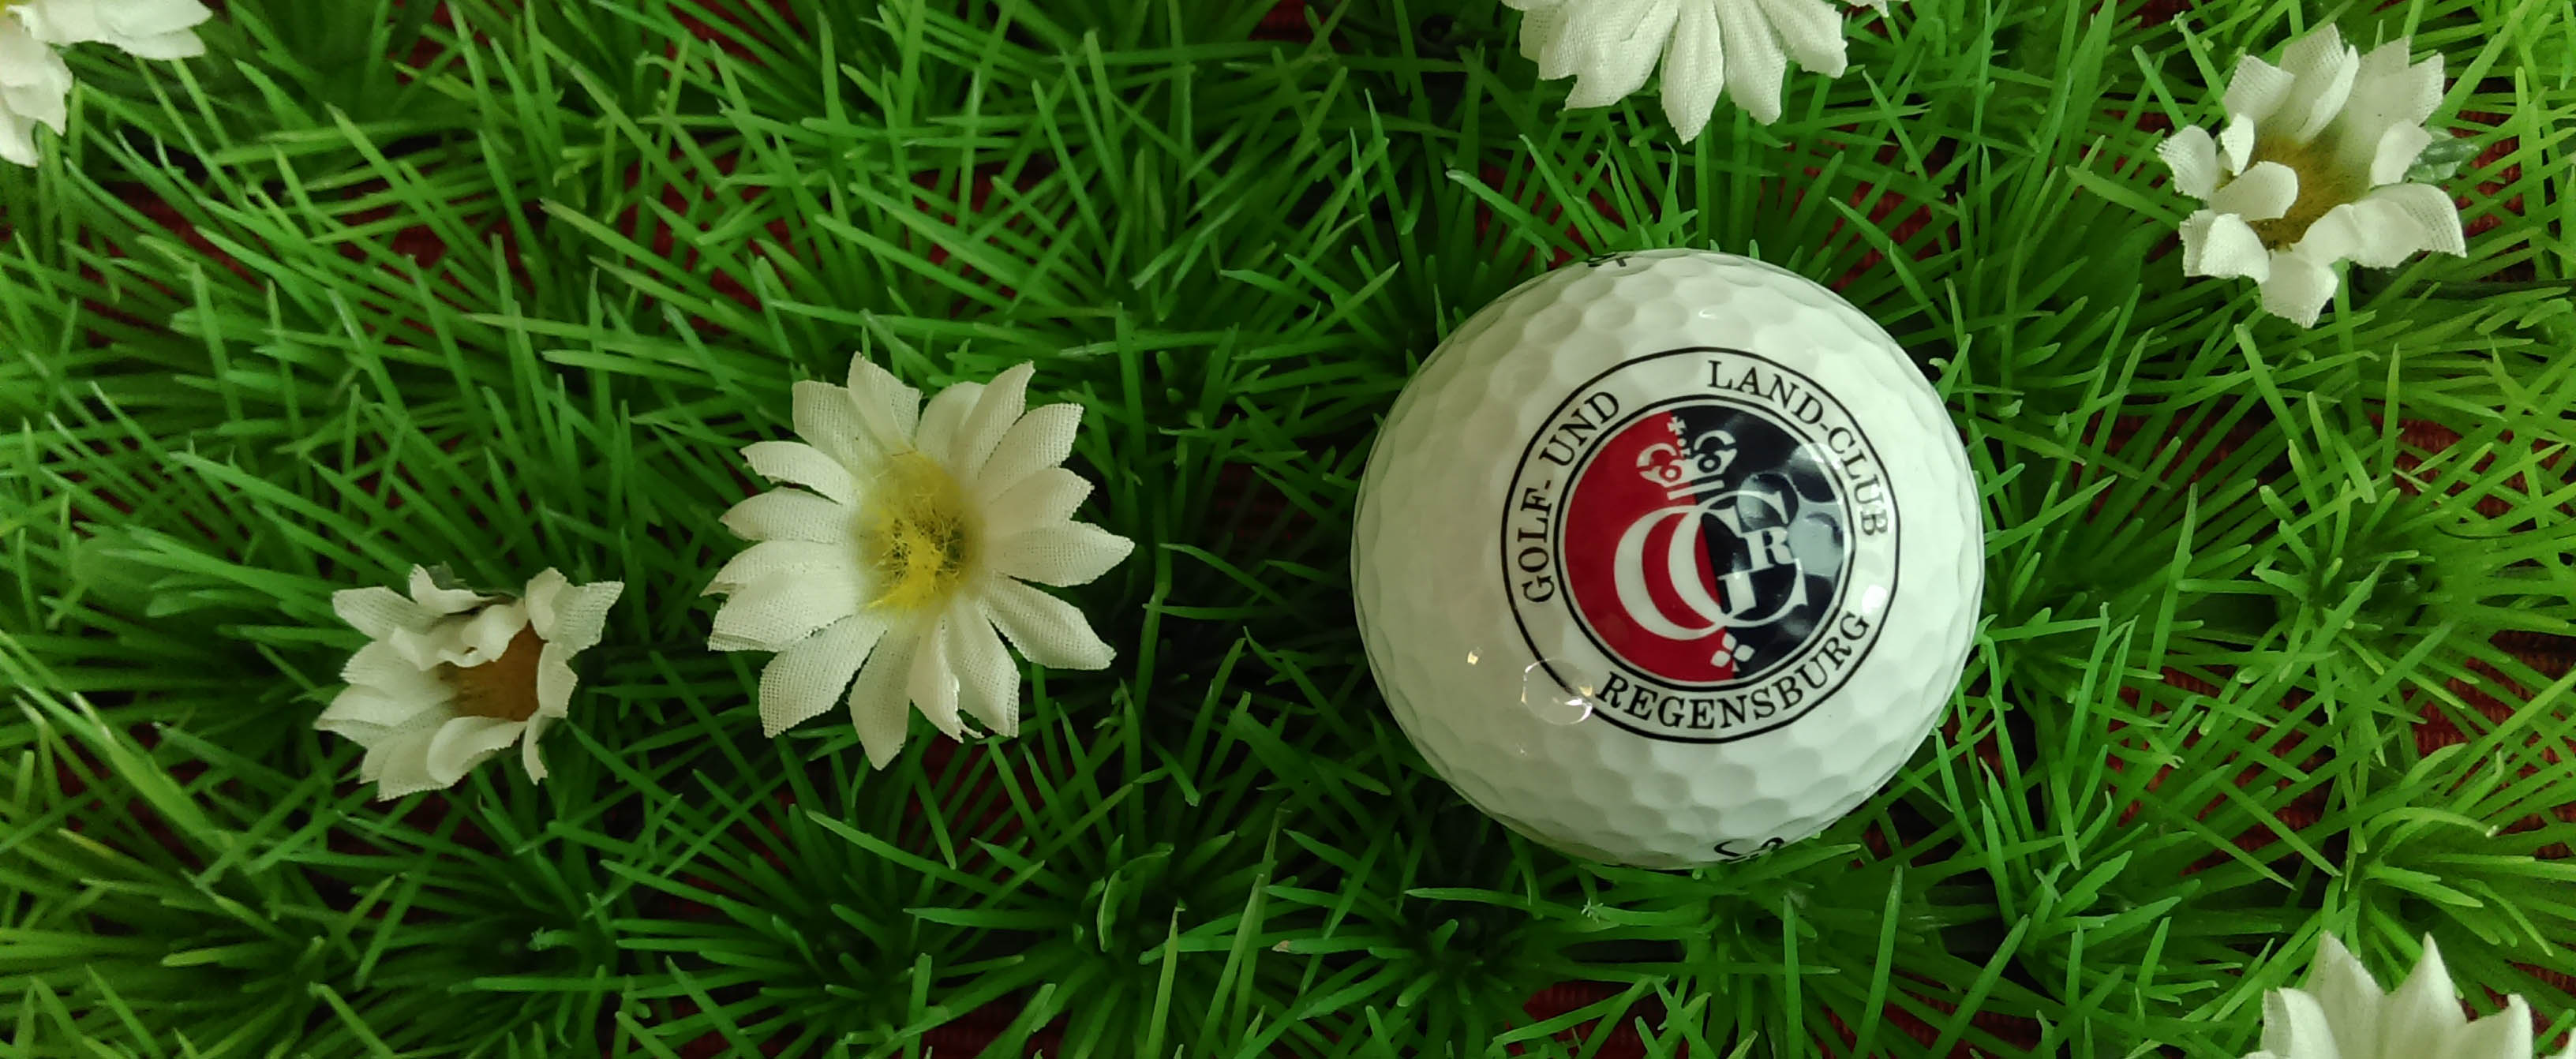 Bild commov.de | Artikel Golf-Tagebuch: Thiergarten einmal anders...